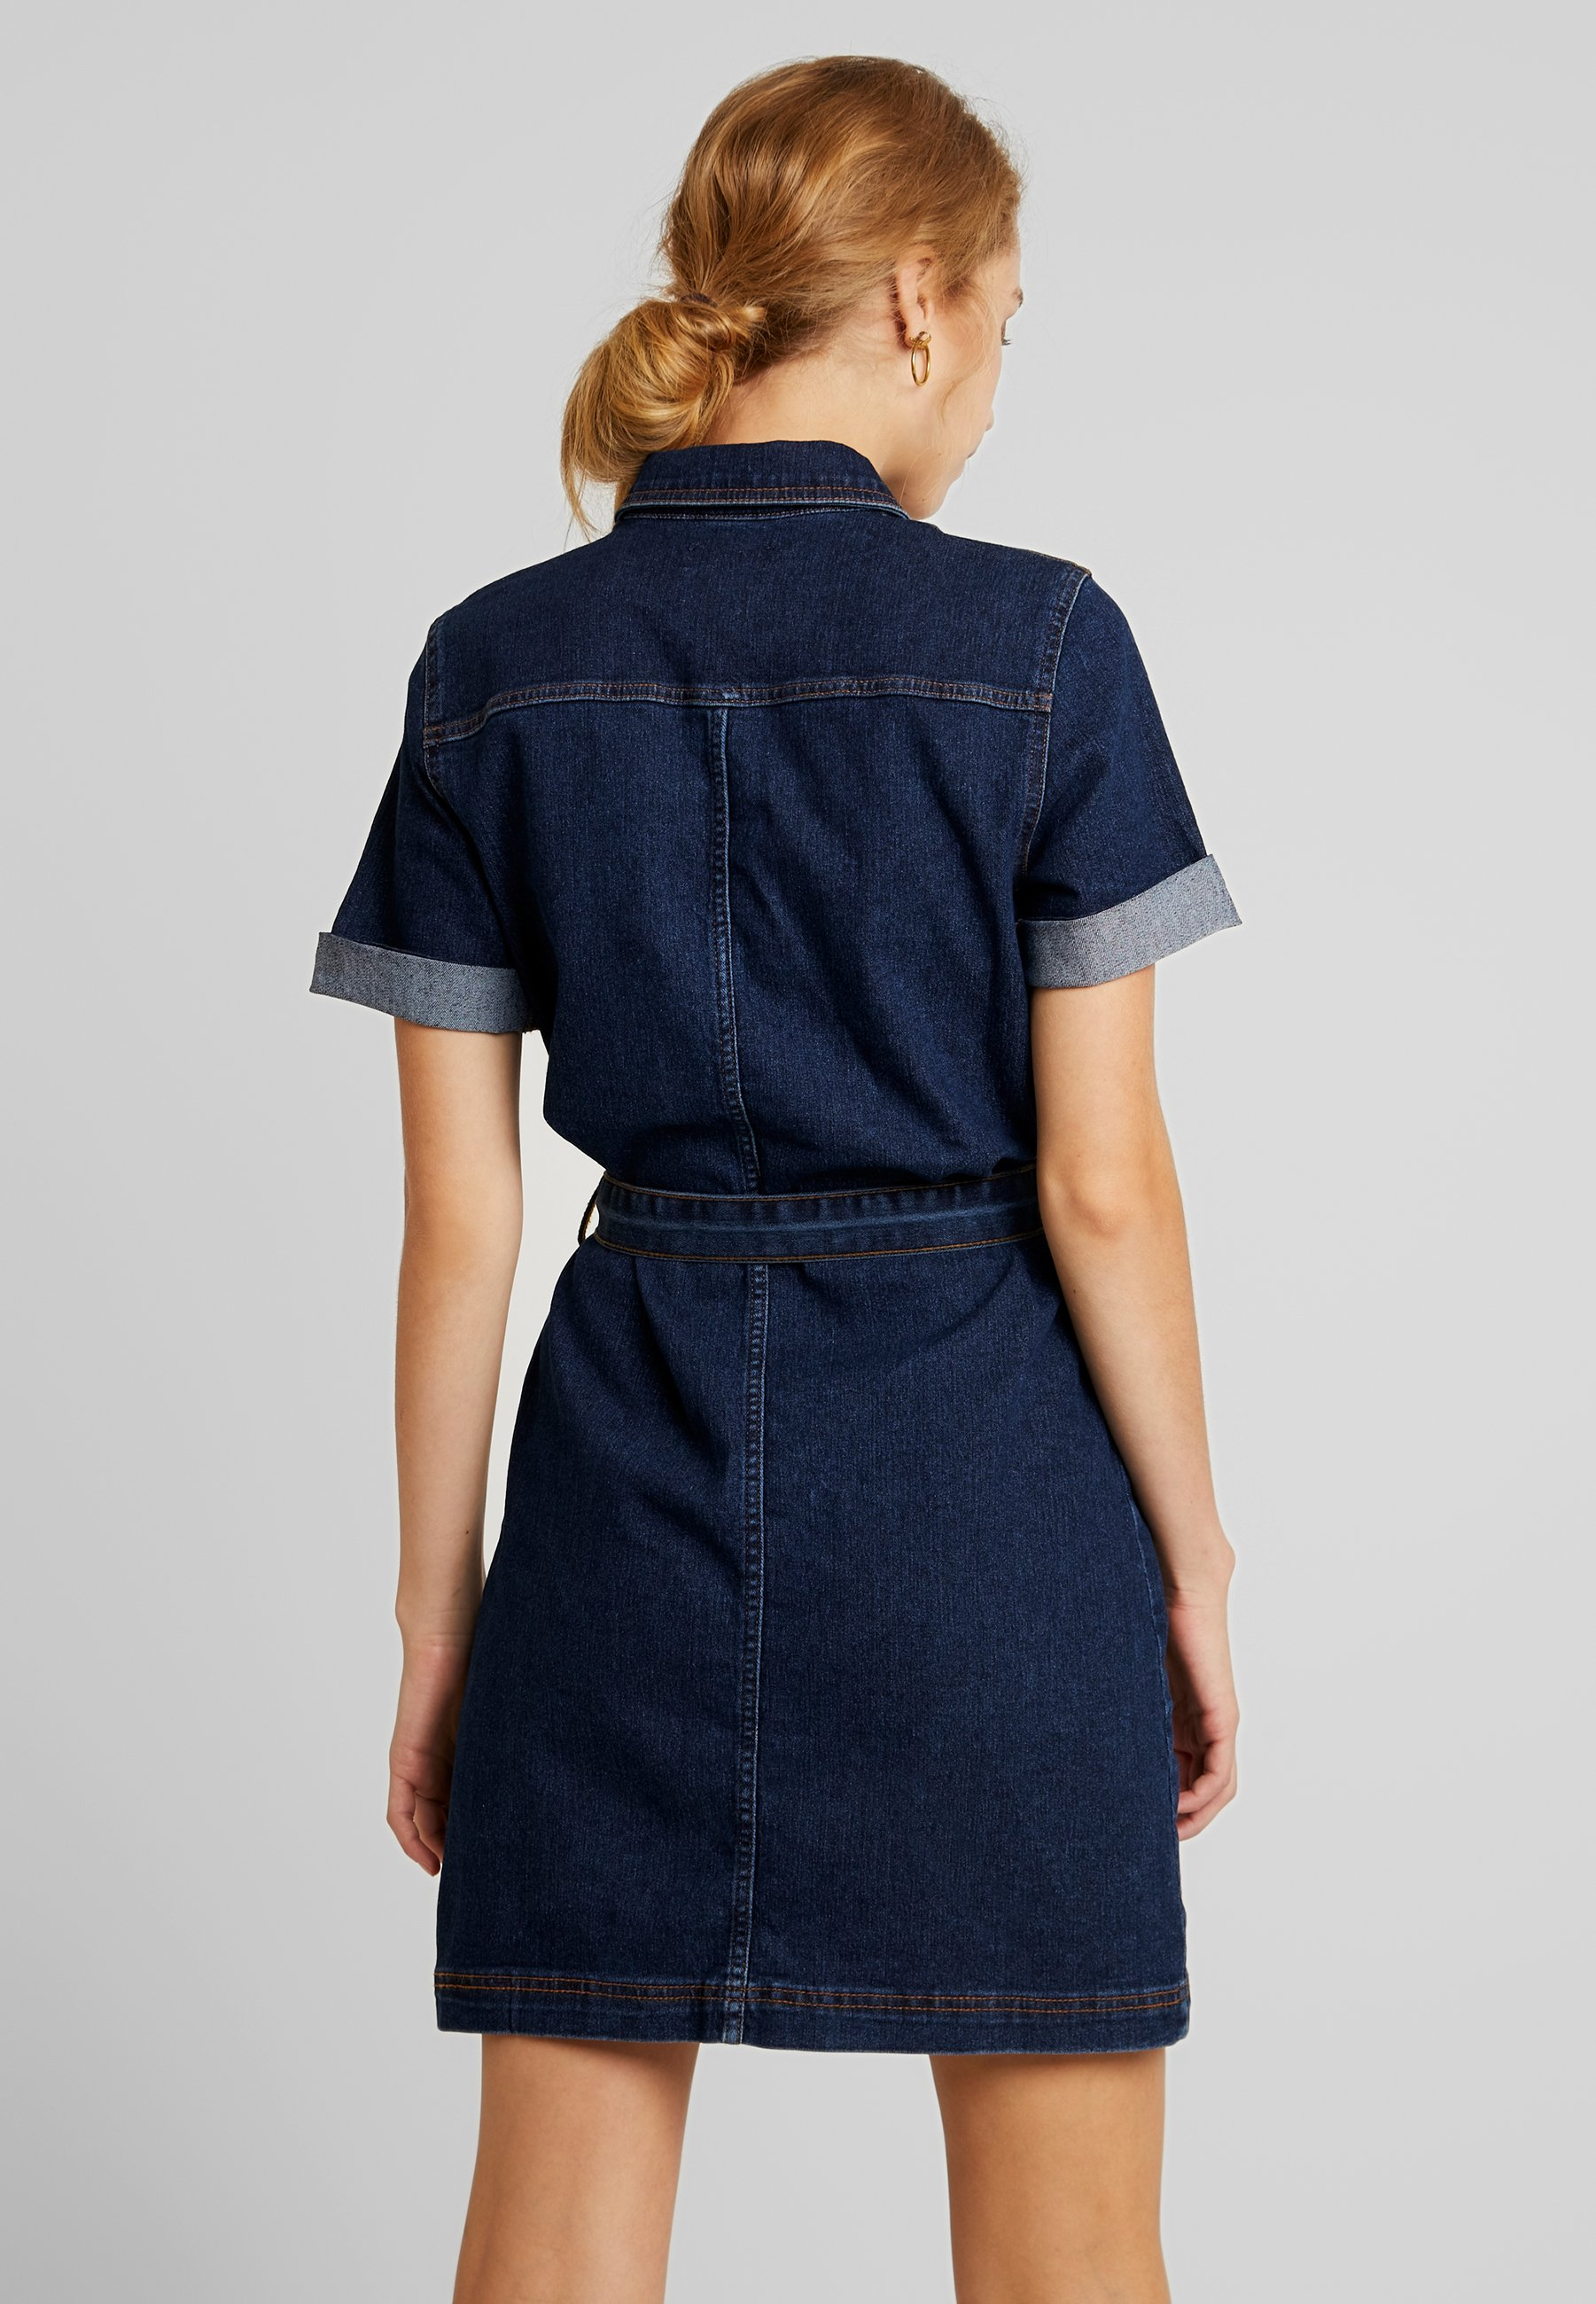 Dark Denim Pchill Blue En Pieces DressRobe Jersey H2ED9IWY